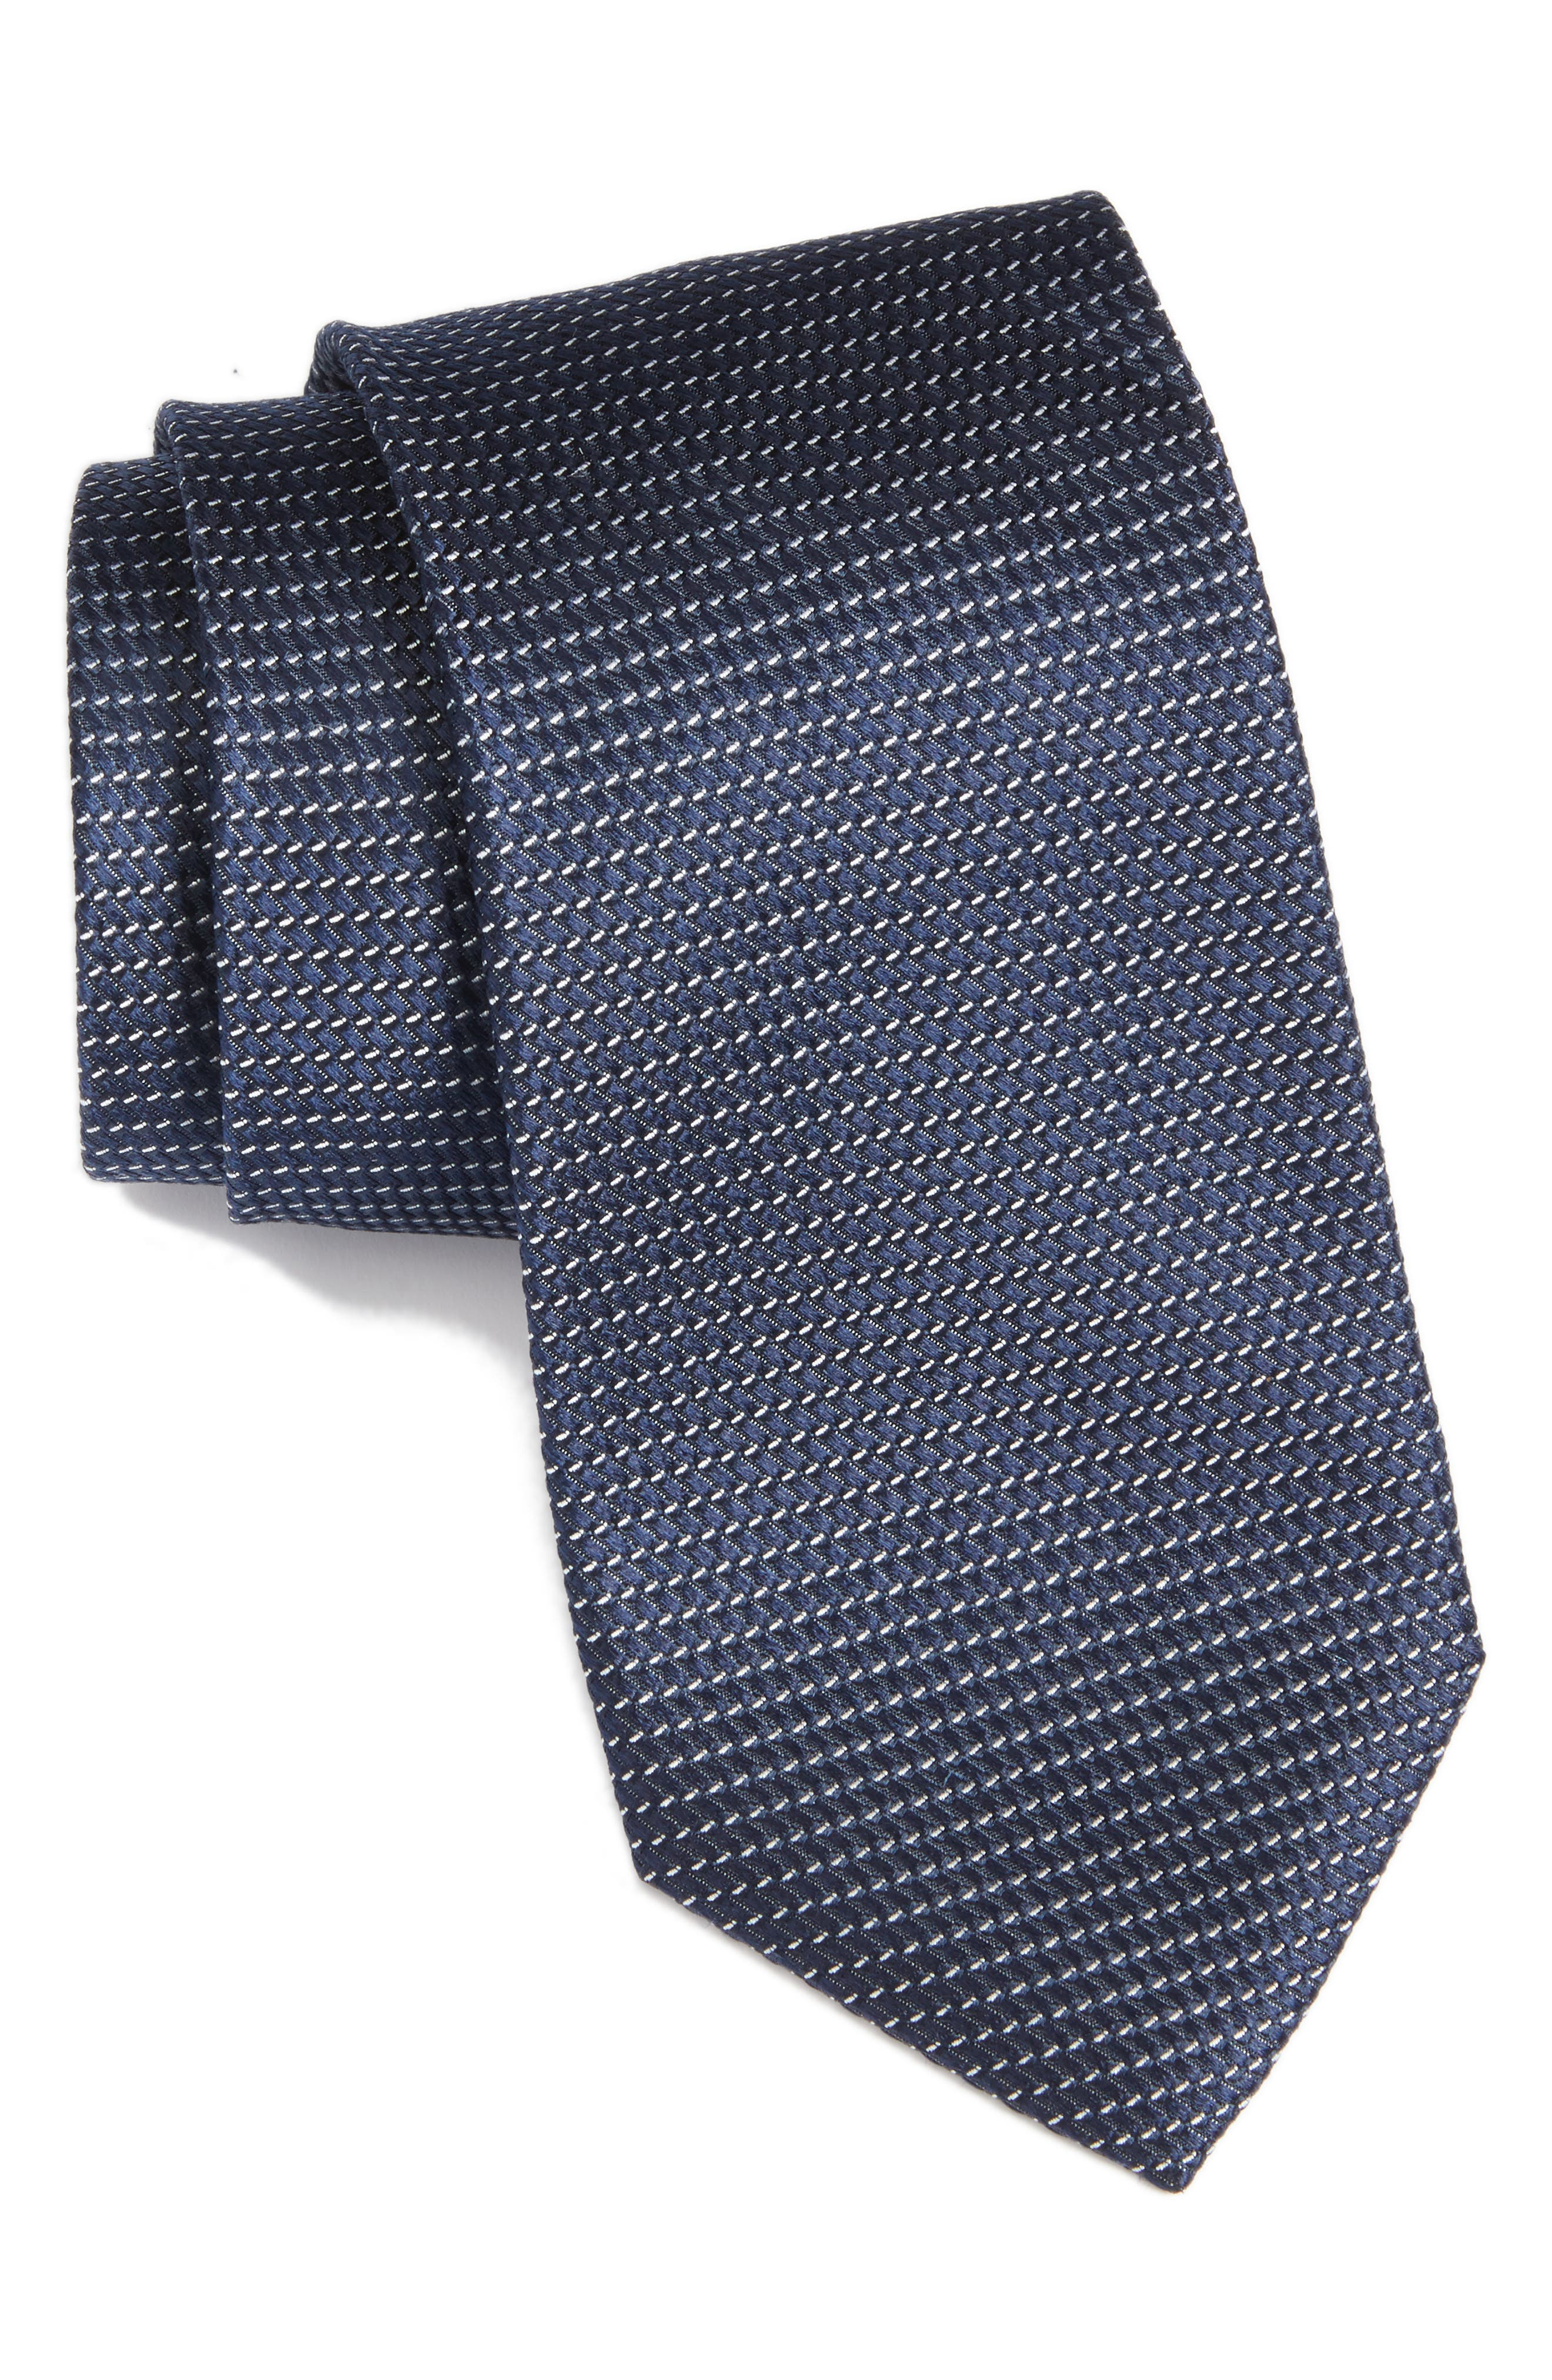 Main Image - Nordstrom Men's Shop Chiana Mini Silk Tie